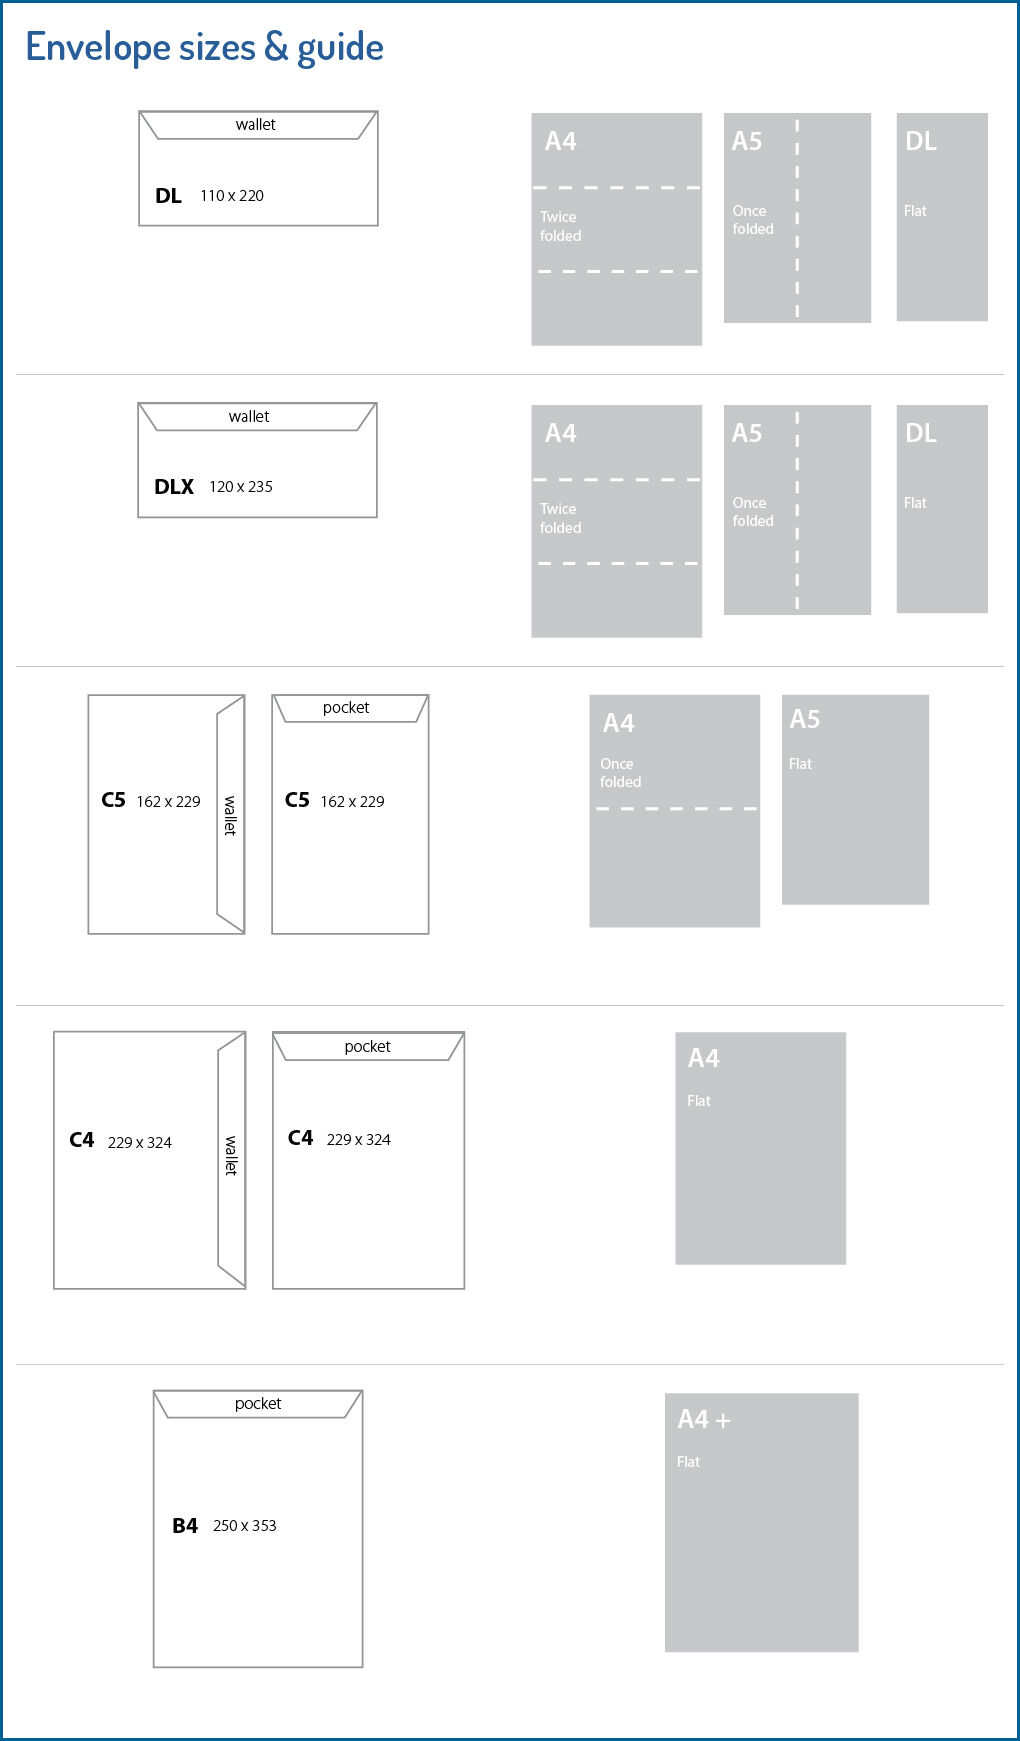 Envelope sizes & guide